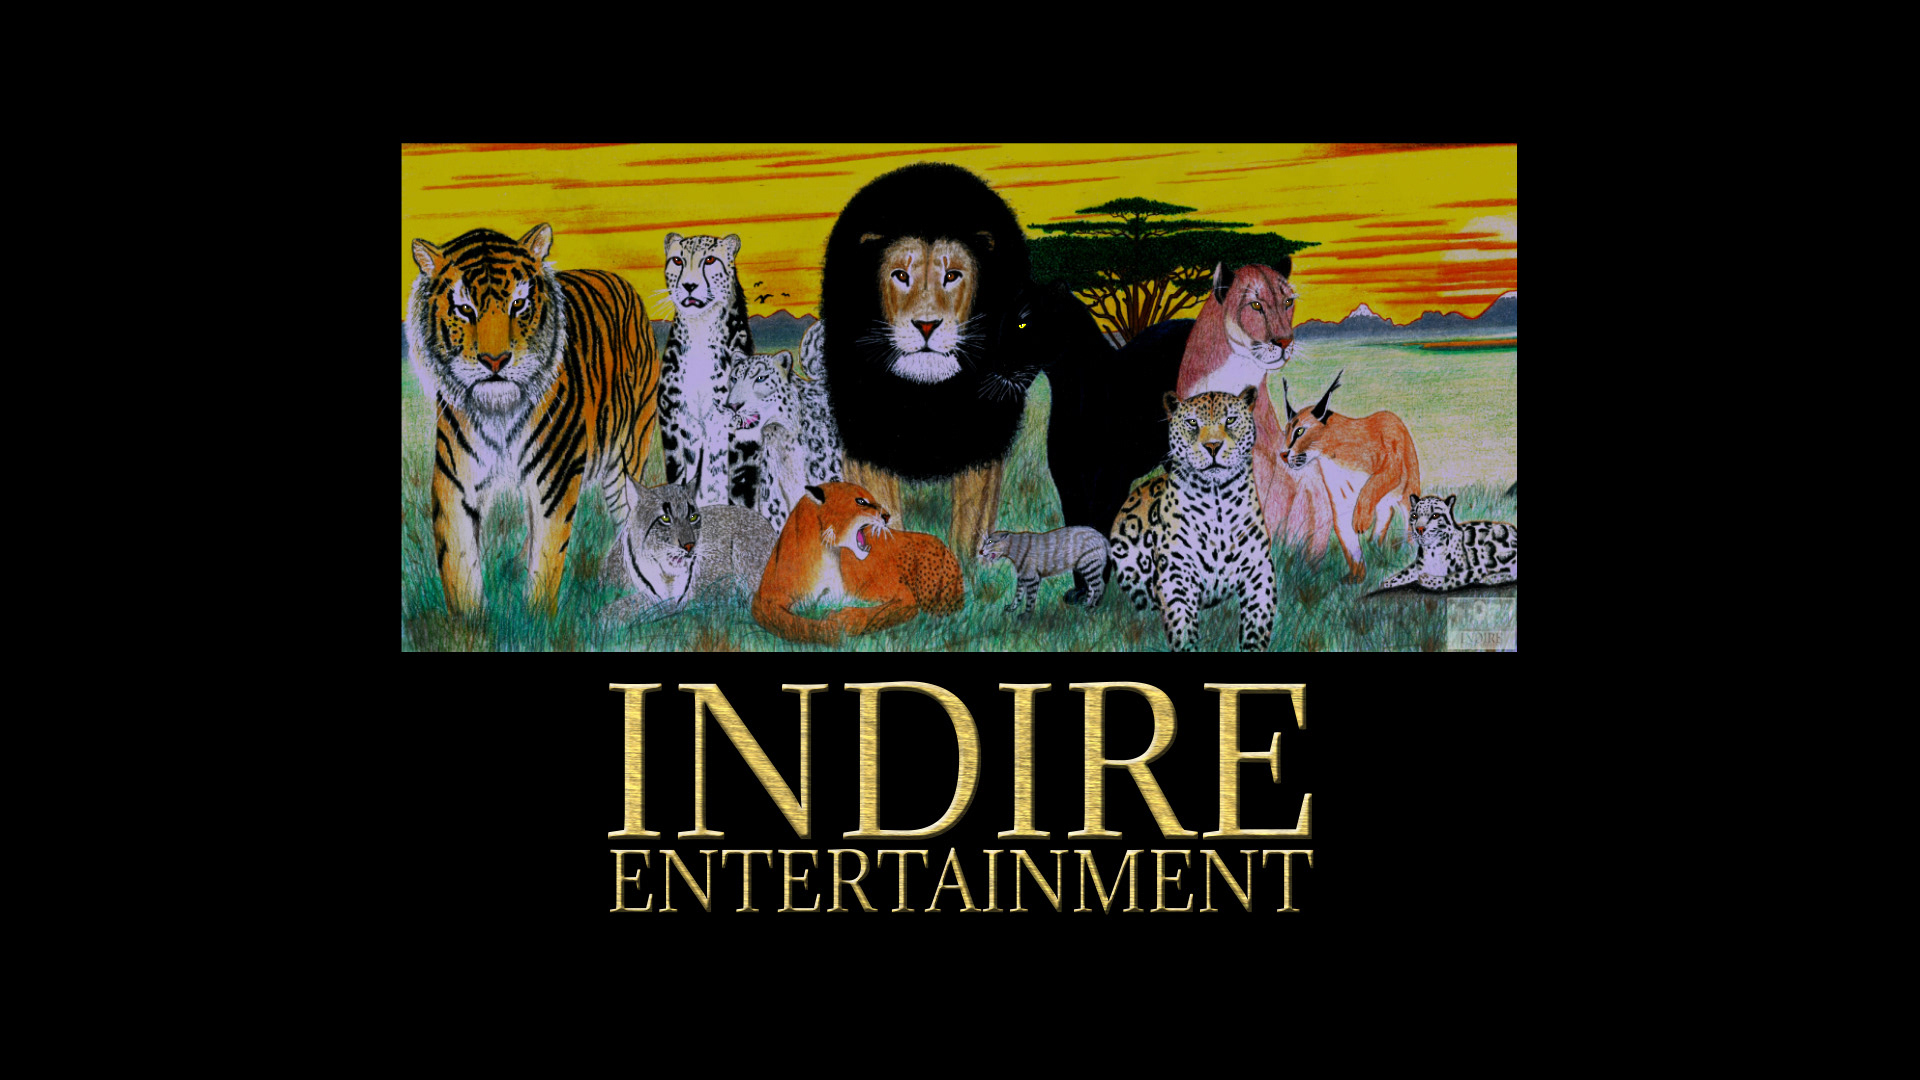 Indire Entertainment